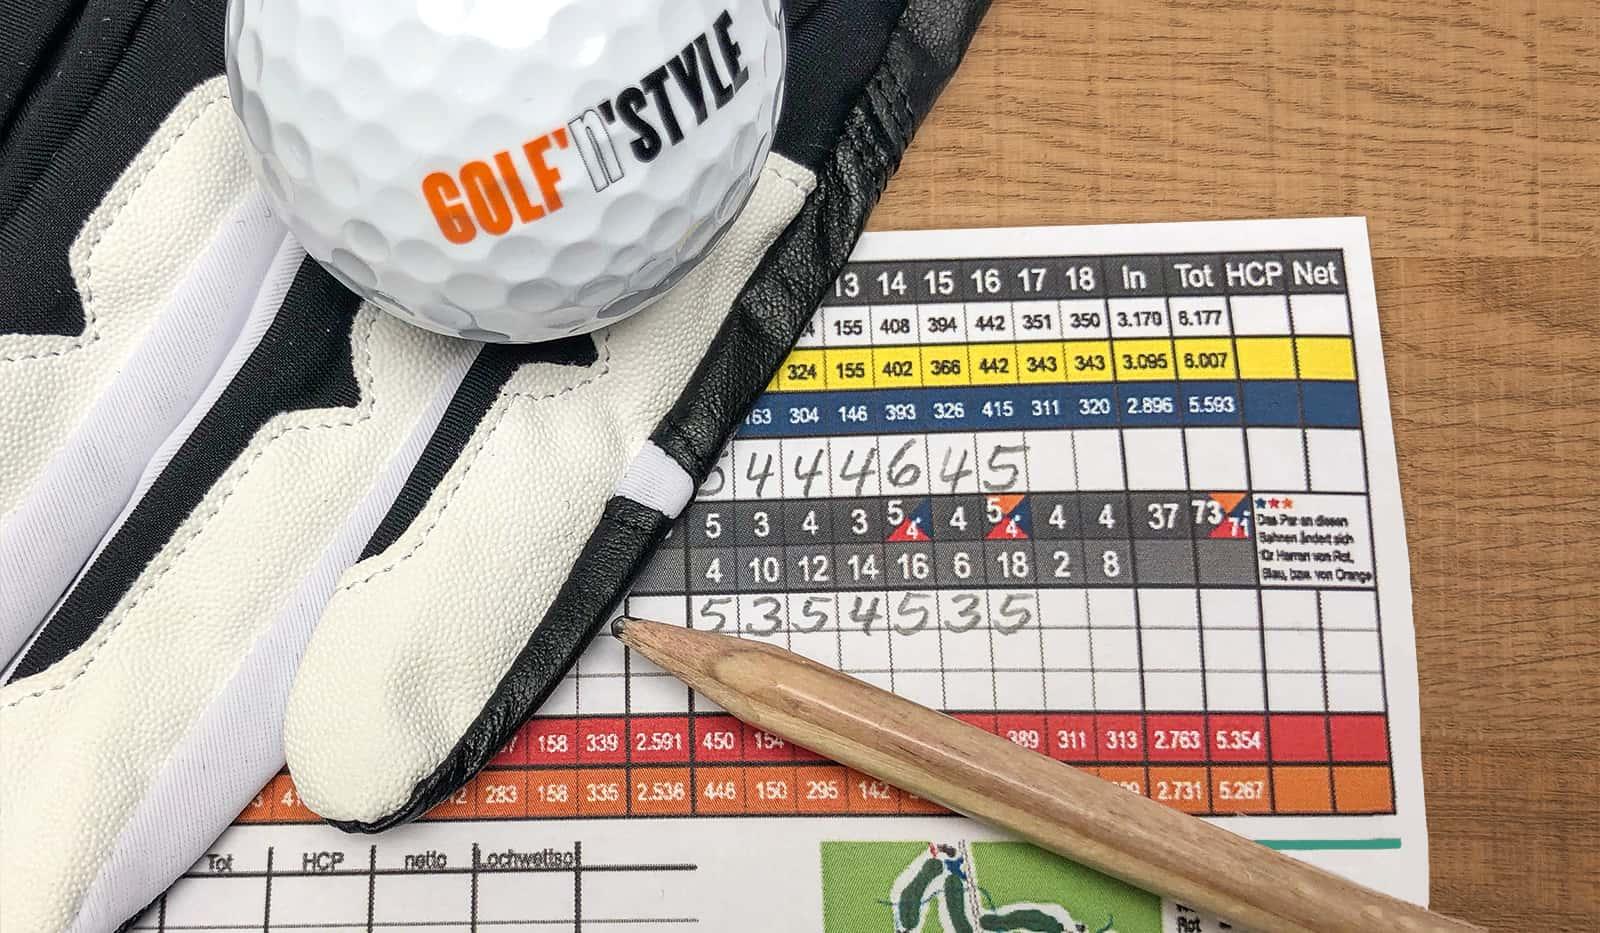 Scorkarte, Golfhandschuh. GOLF'n'STYLE Golfball